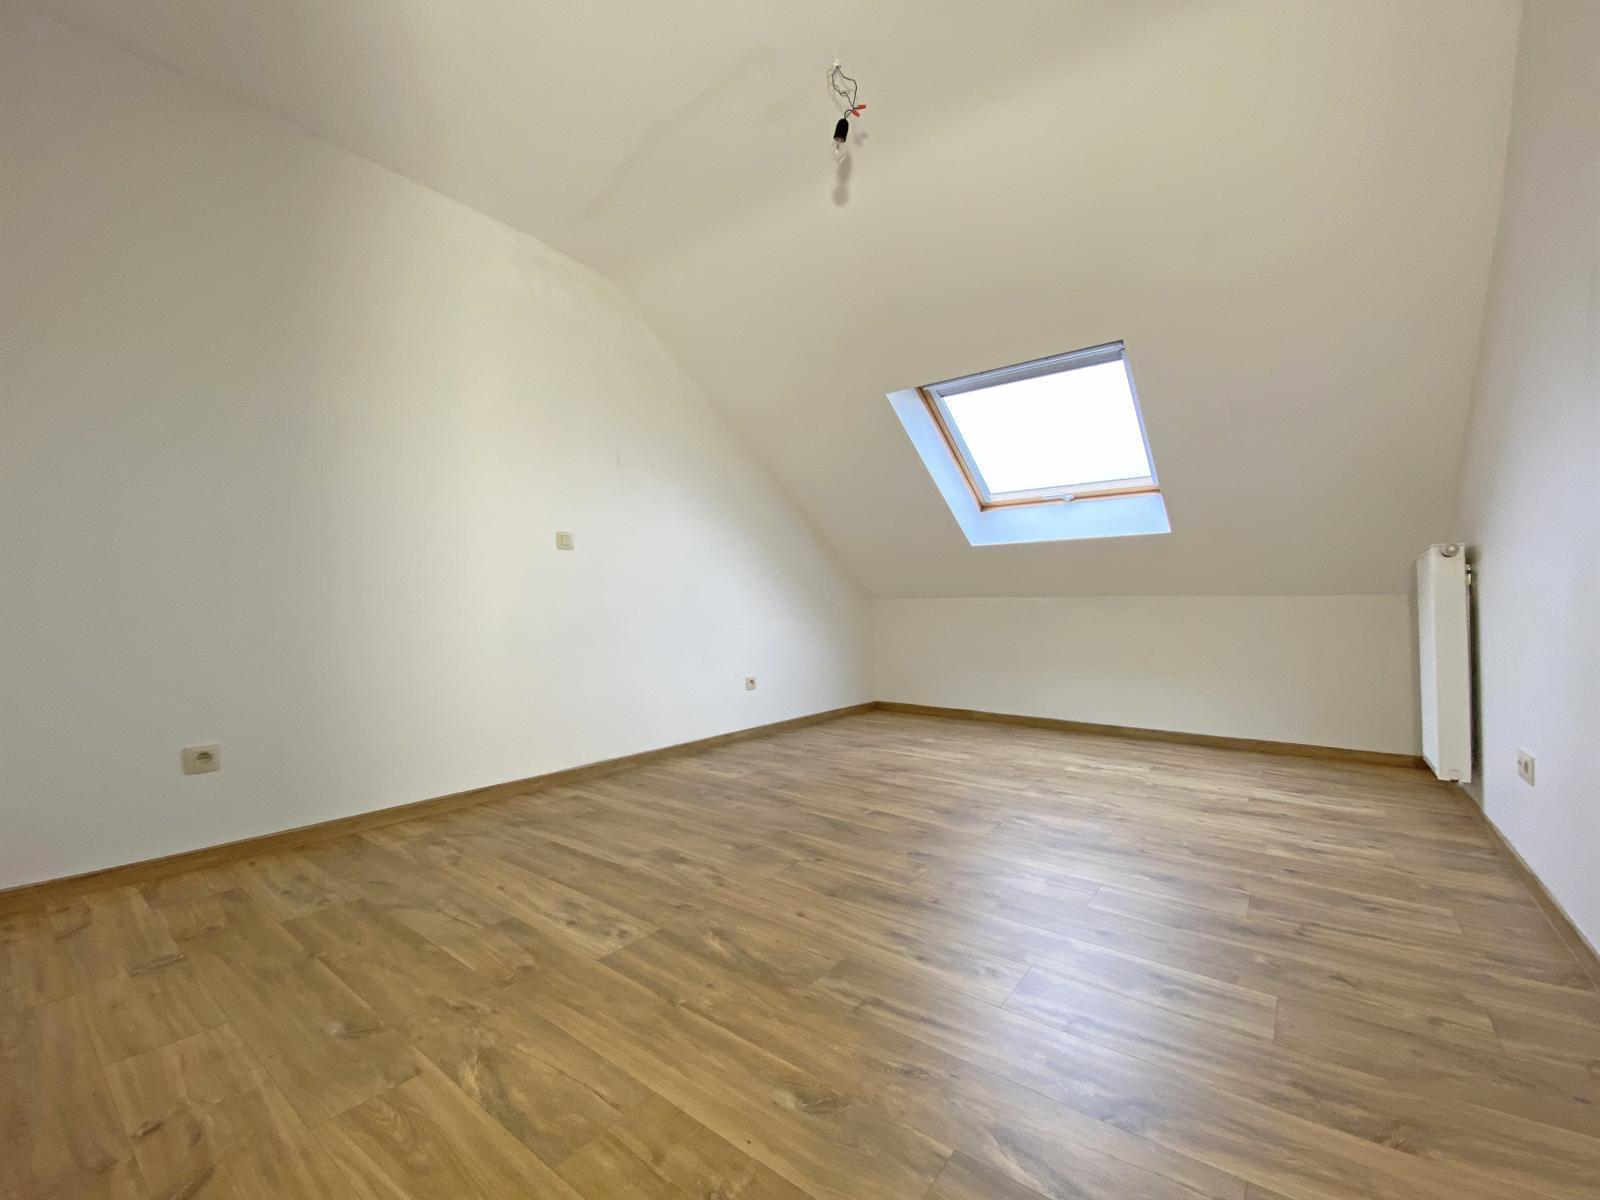 Appartement - Bertrix - #4507479-5